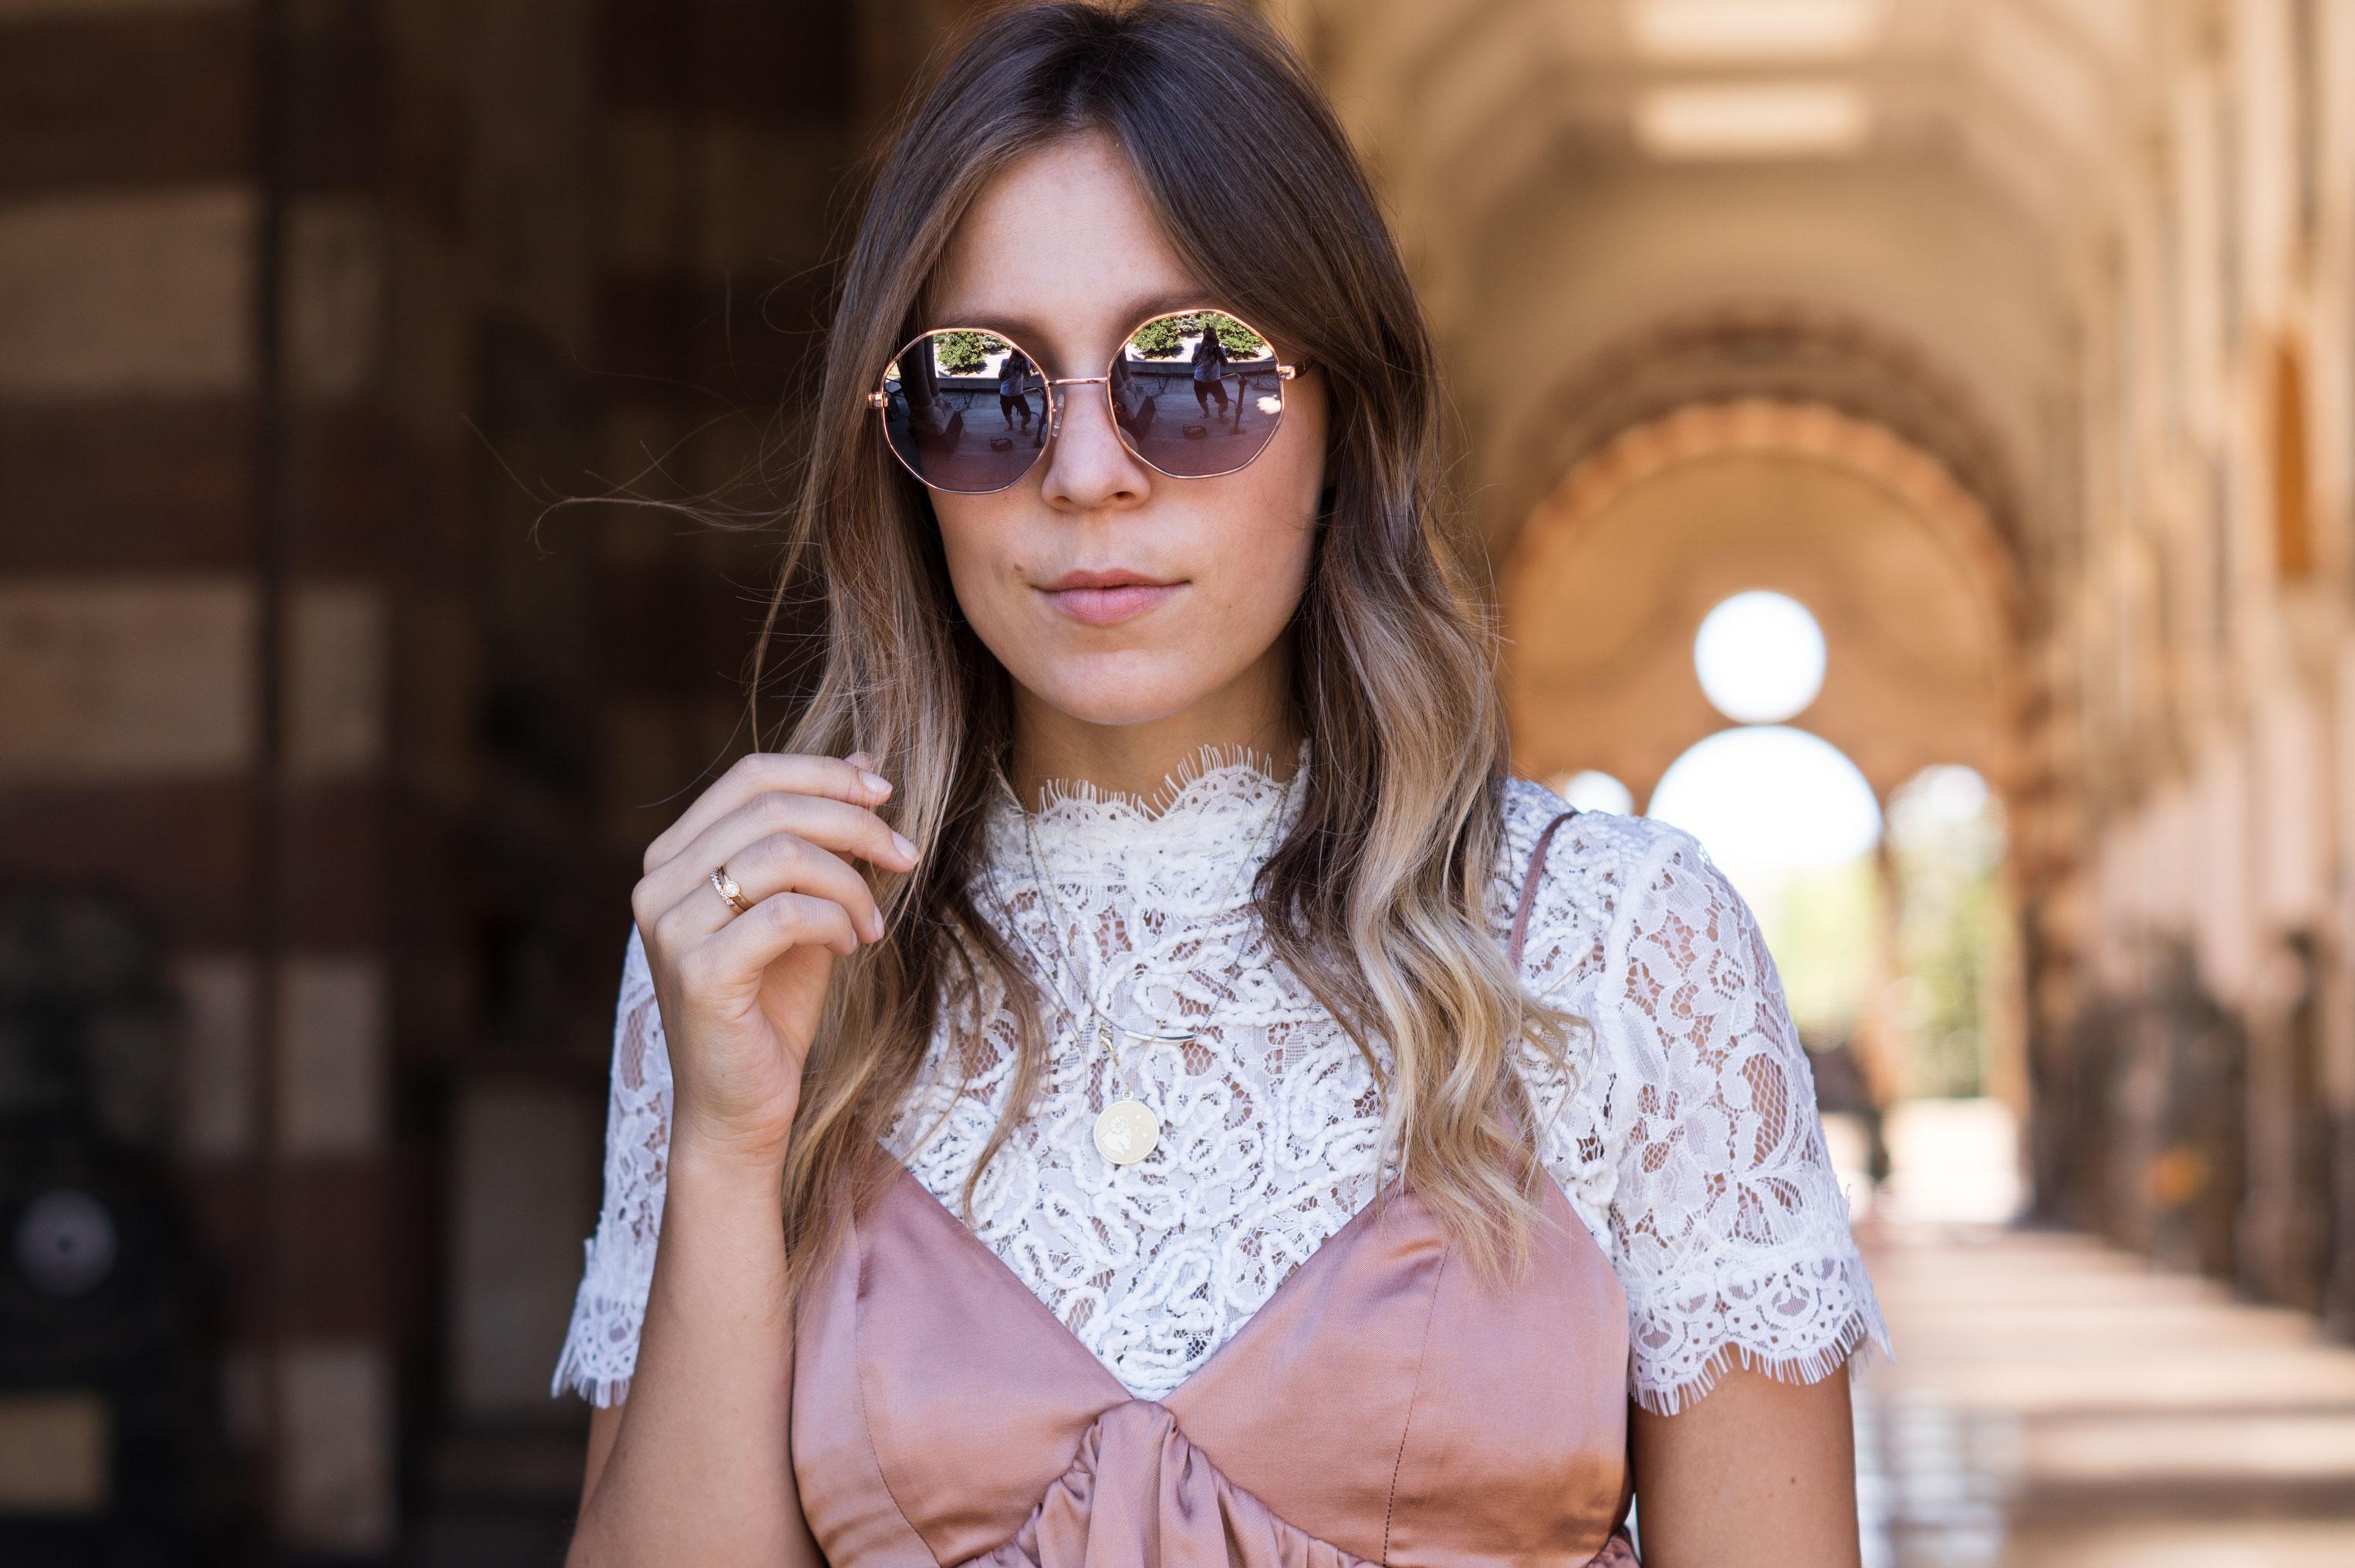 Copper Slipdress rosa Satinkleid silk dress ruffles Rüschenkleid H&M Sariety Modeblog Heidelberg Fashionblogger Milan Mailand Shooting-4